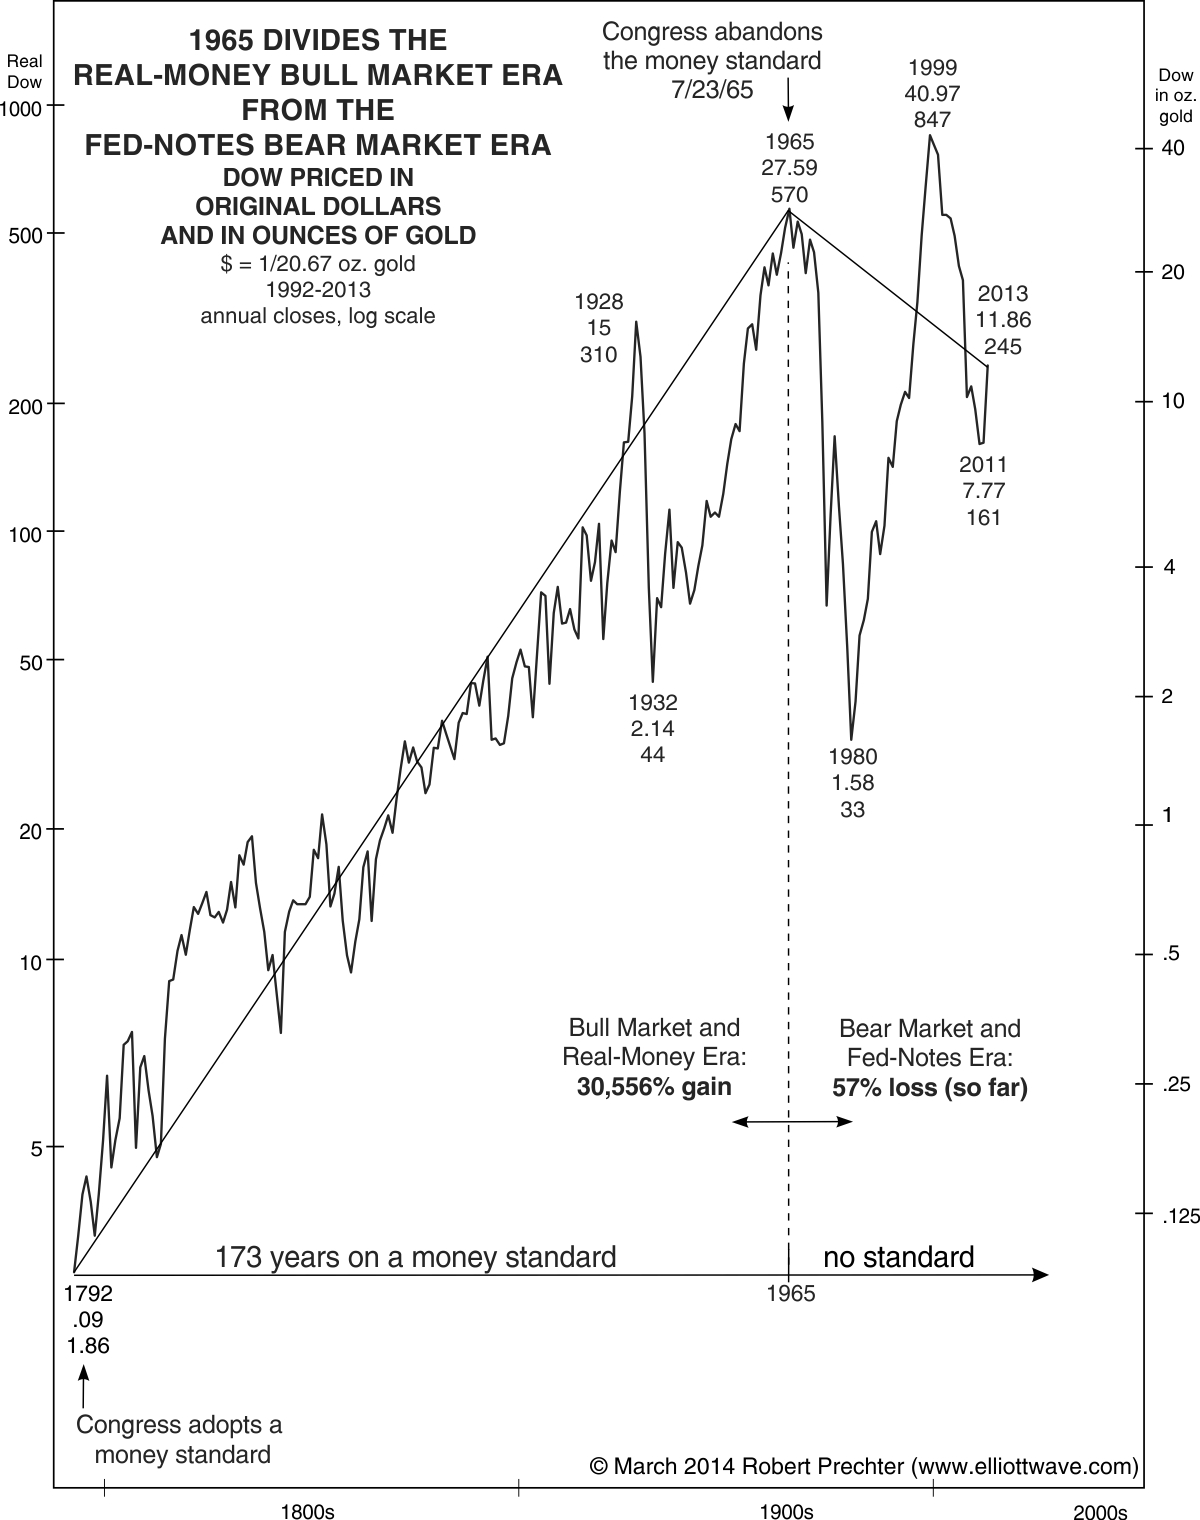 1965 - Bull Market vs. Bear Market